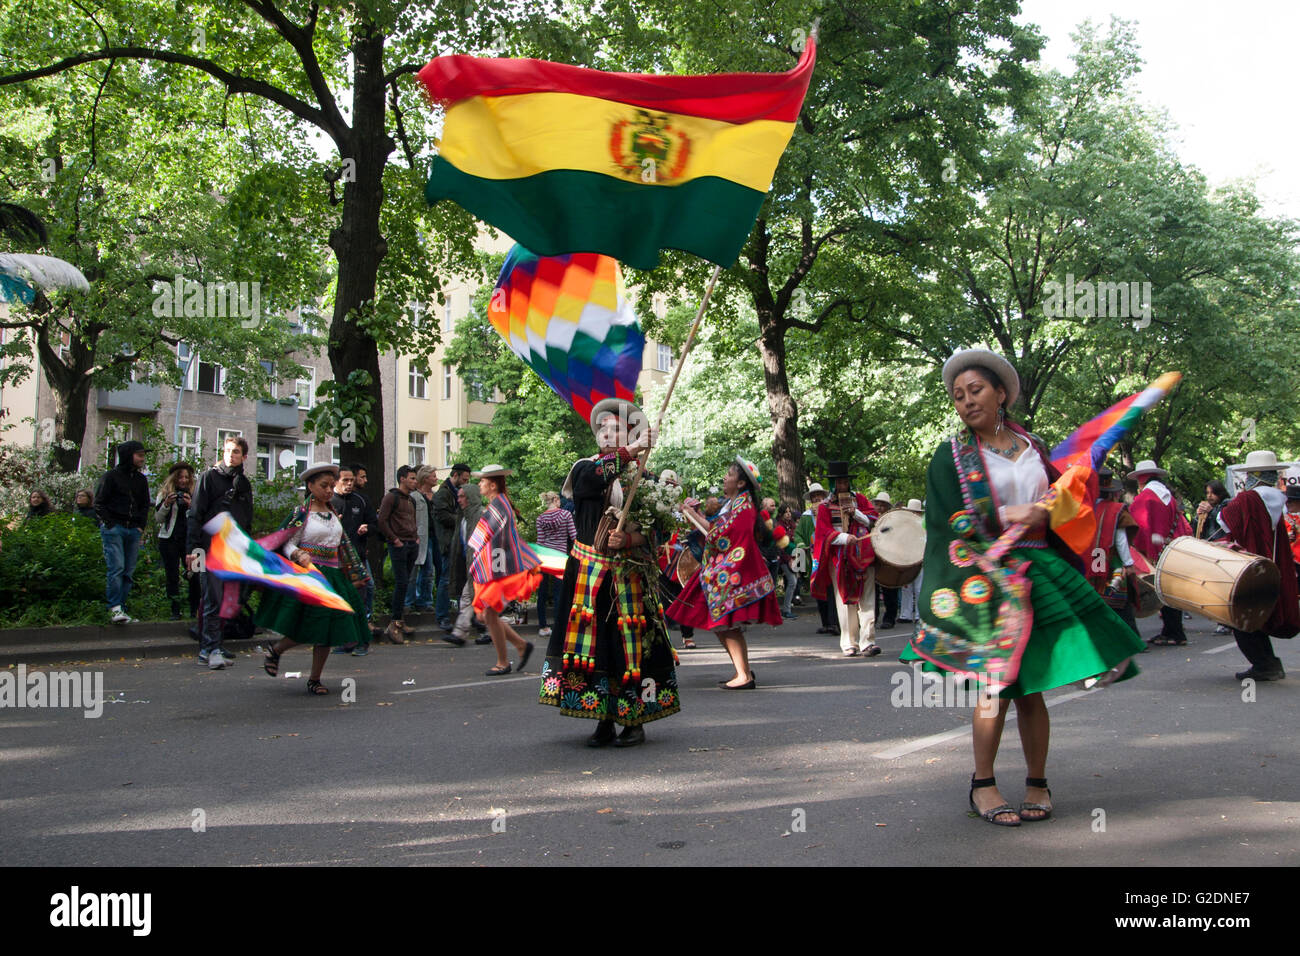 Karneval der Kulturen. Berlin, Deutschland. Stockbild